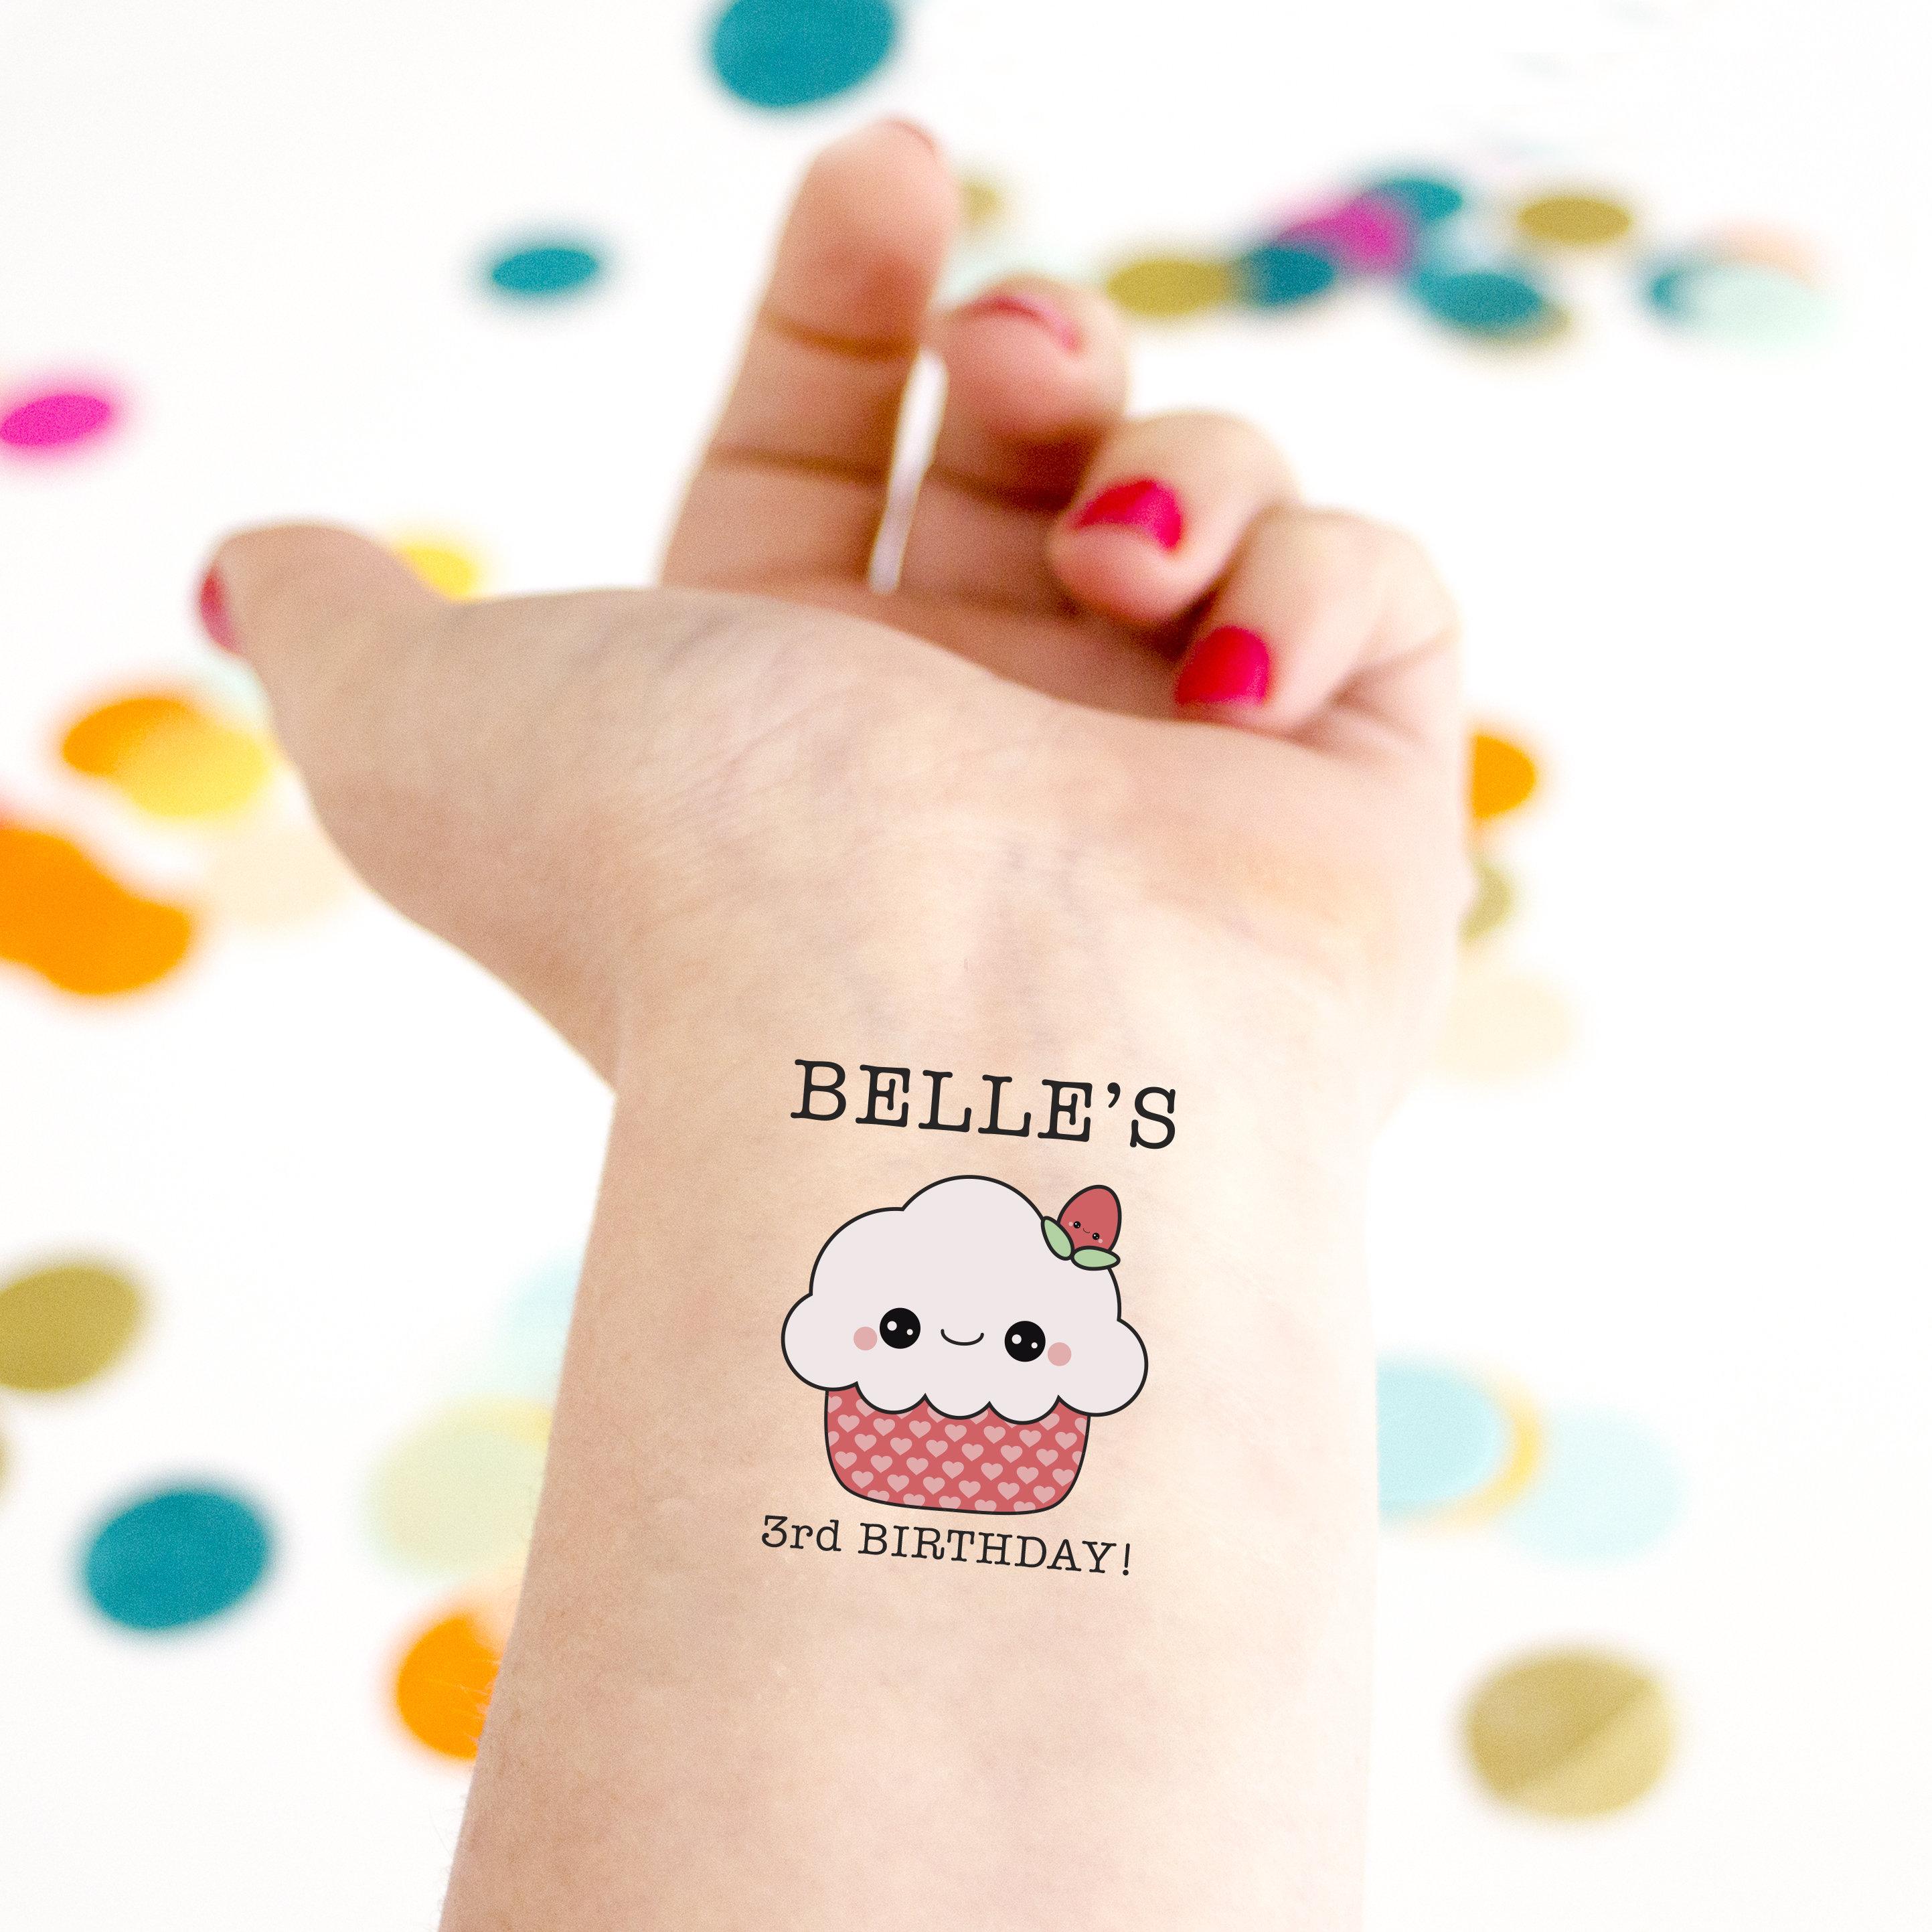 Cupcake Temporary Tattoos Kid birthday kid tattoo Party   Etsy